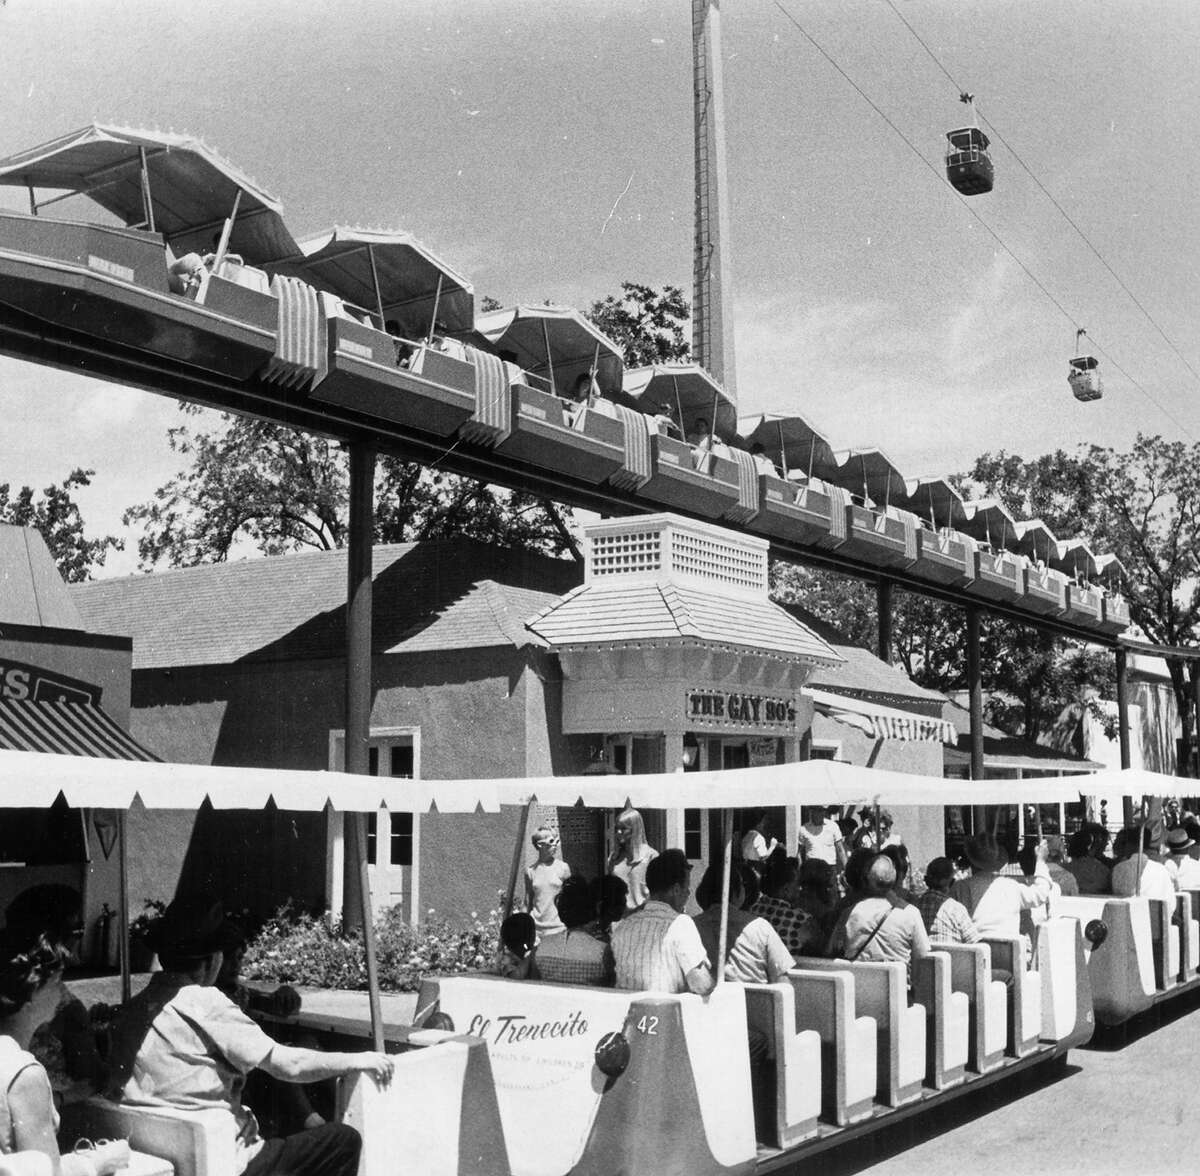 HemisFair, photographed July 19, 1968.